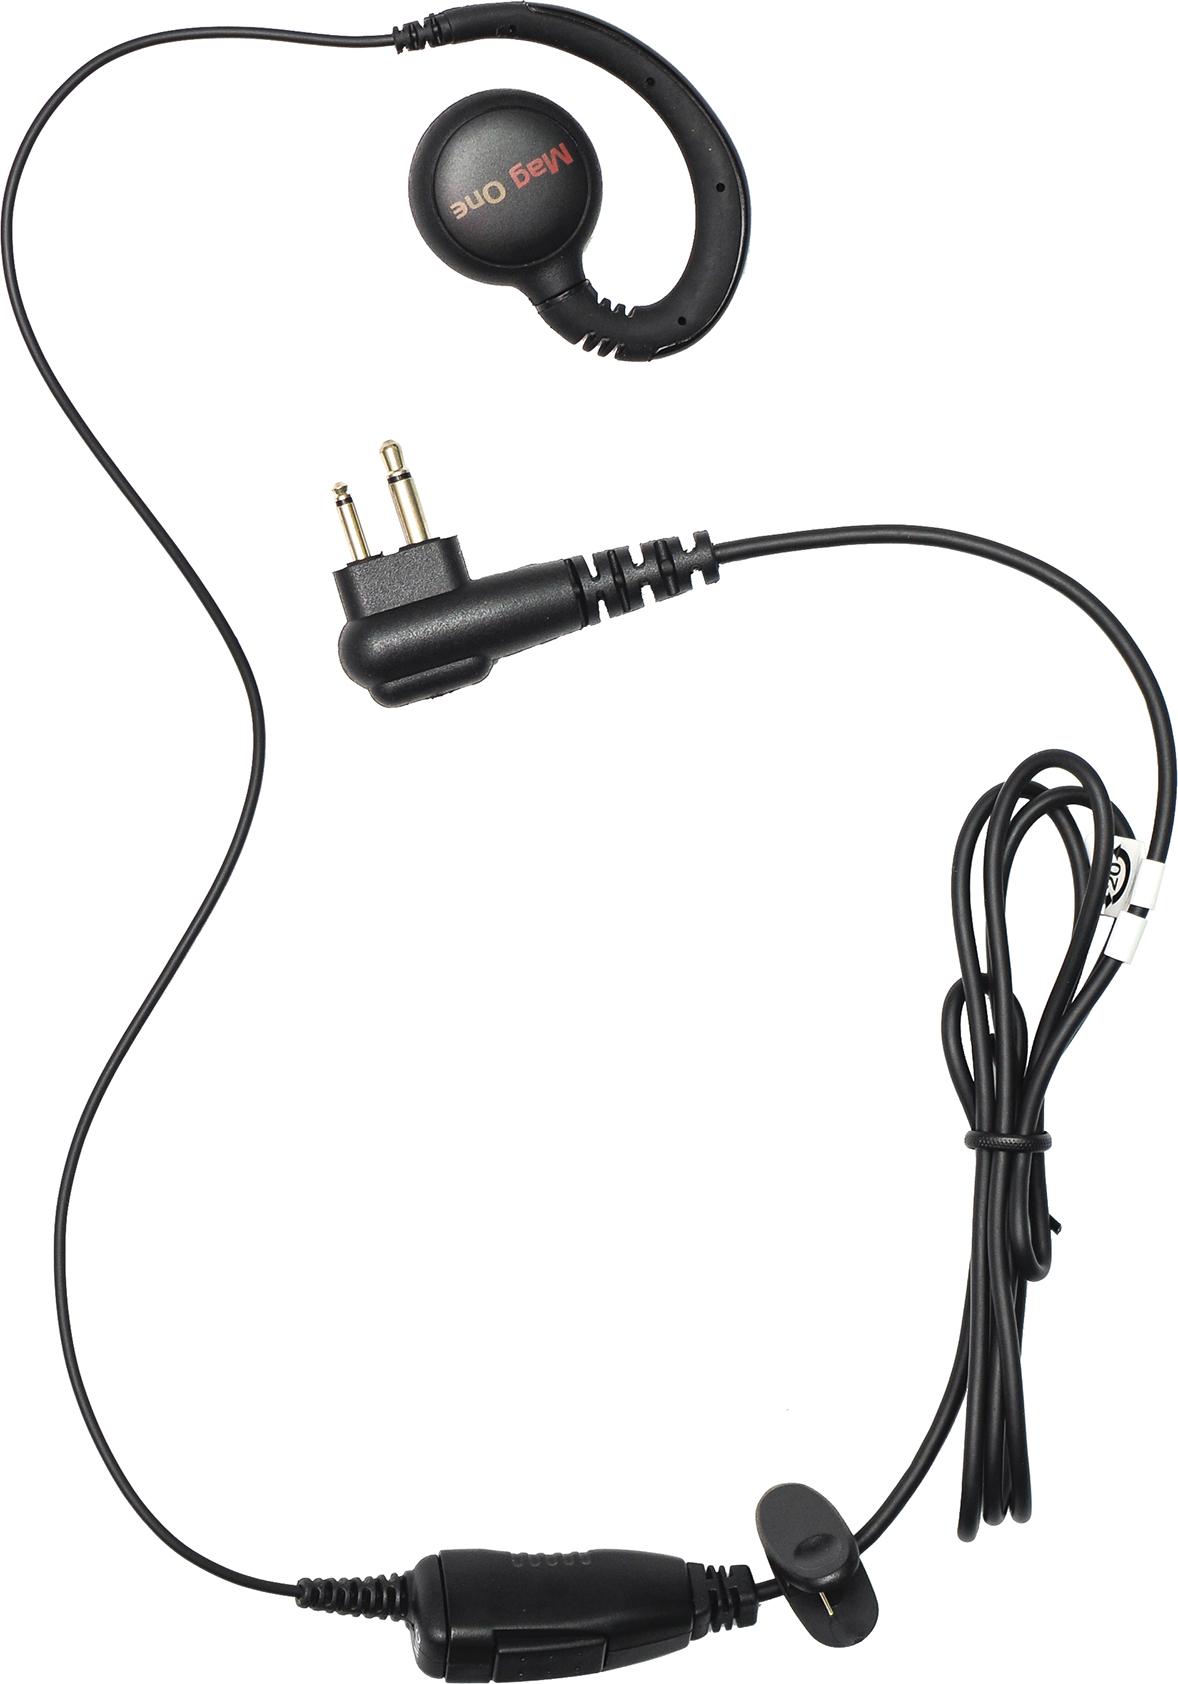 MagOne PMLN6532 - Enkel handsfree med vridbar öronbygel  6c1afd9506b99